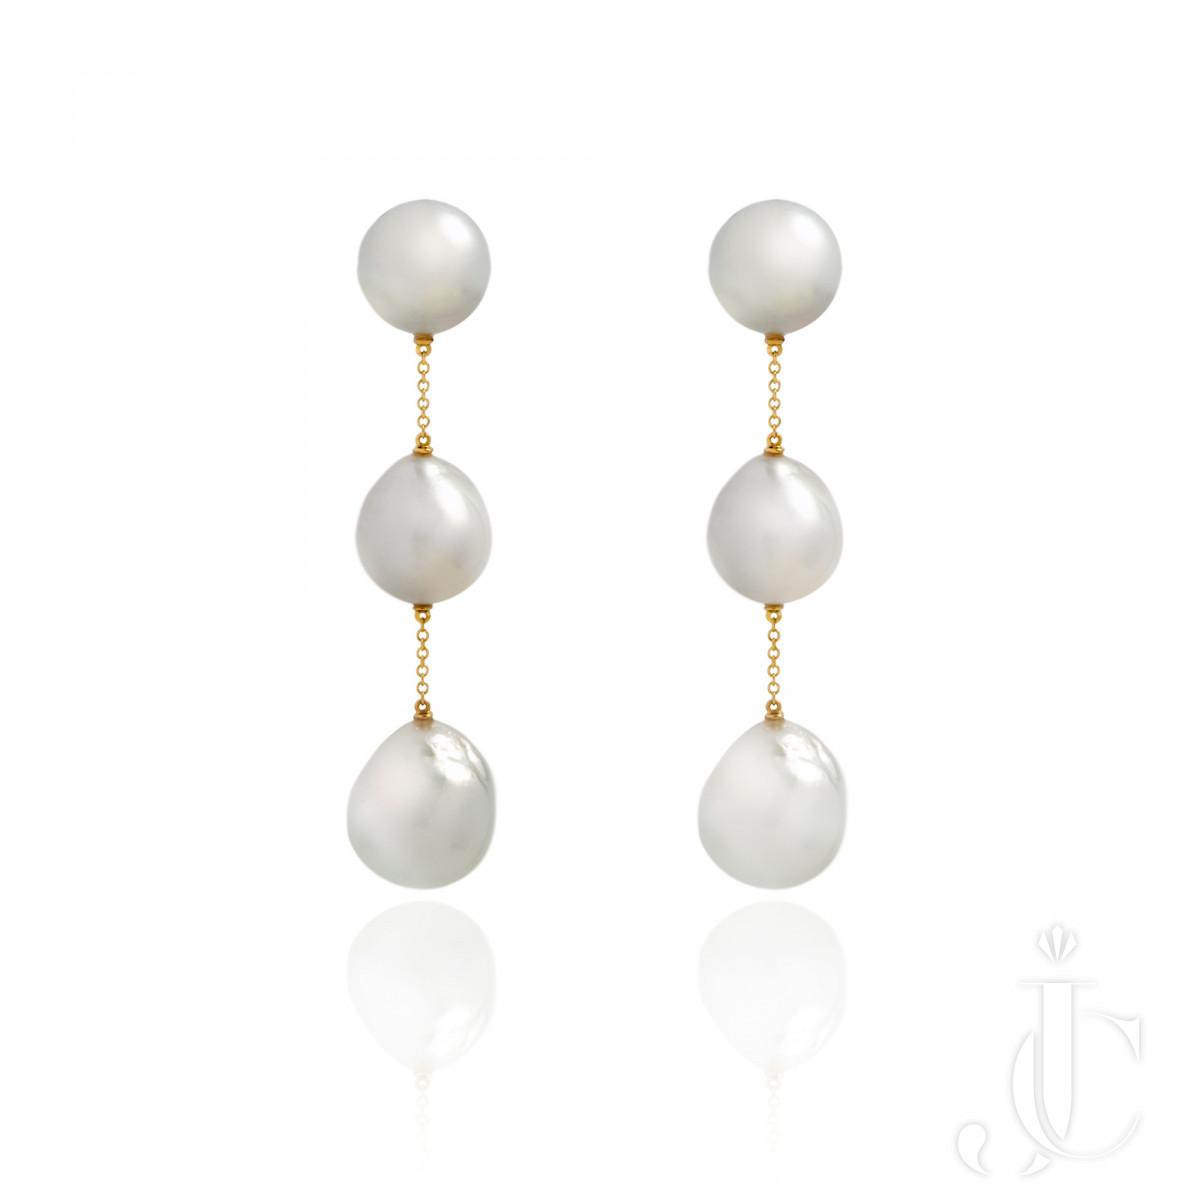 An Order of Bling Baroque Pearl Earrings 18K Karat Yellow Gold